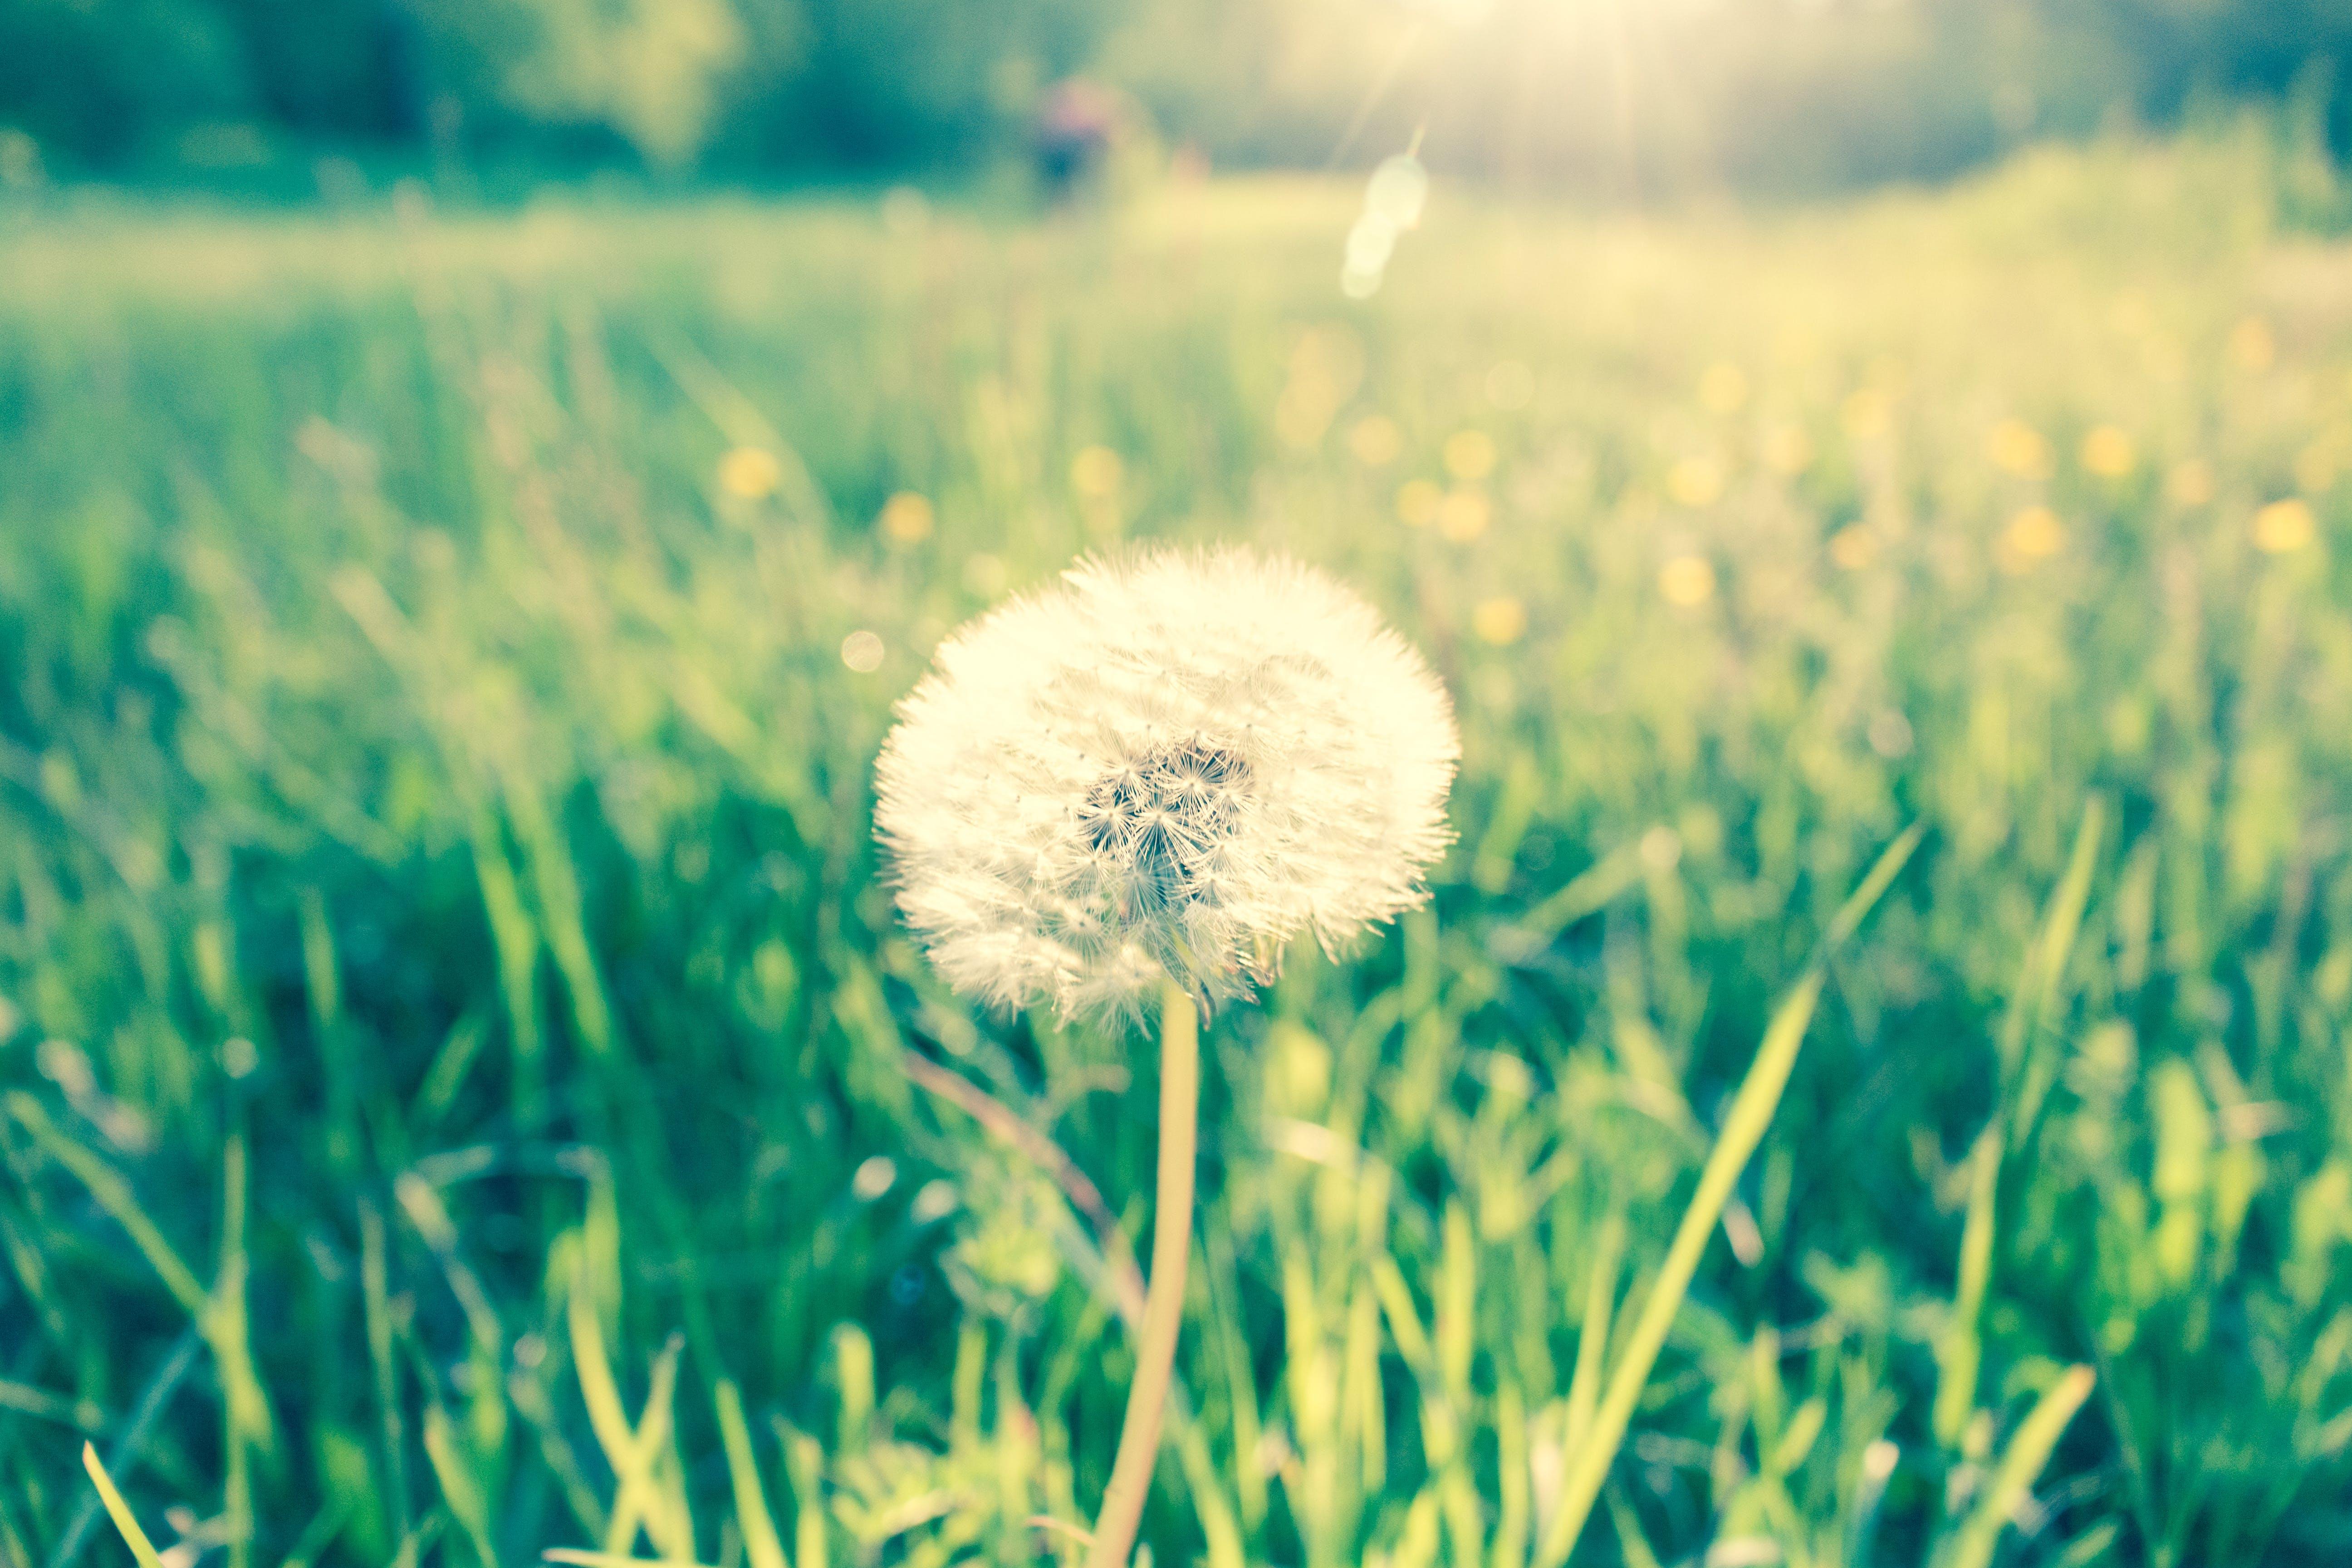 Shallow Focus of Dandelion